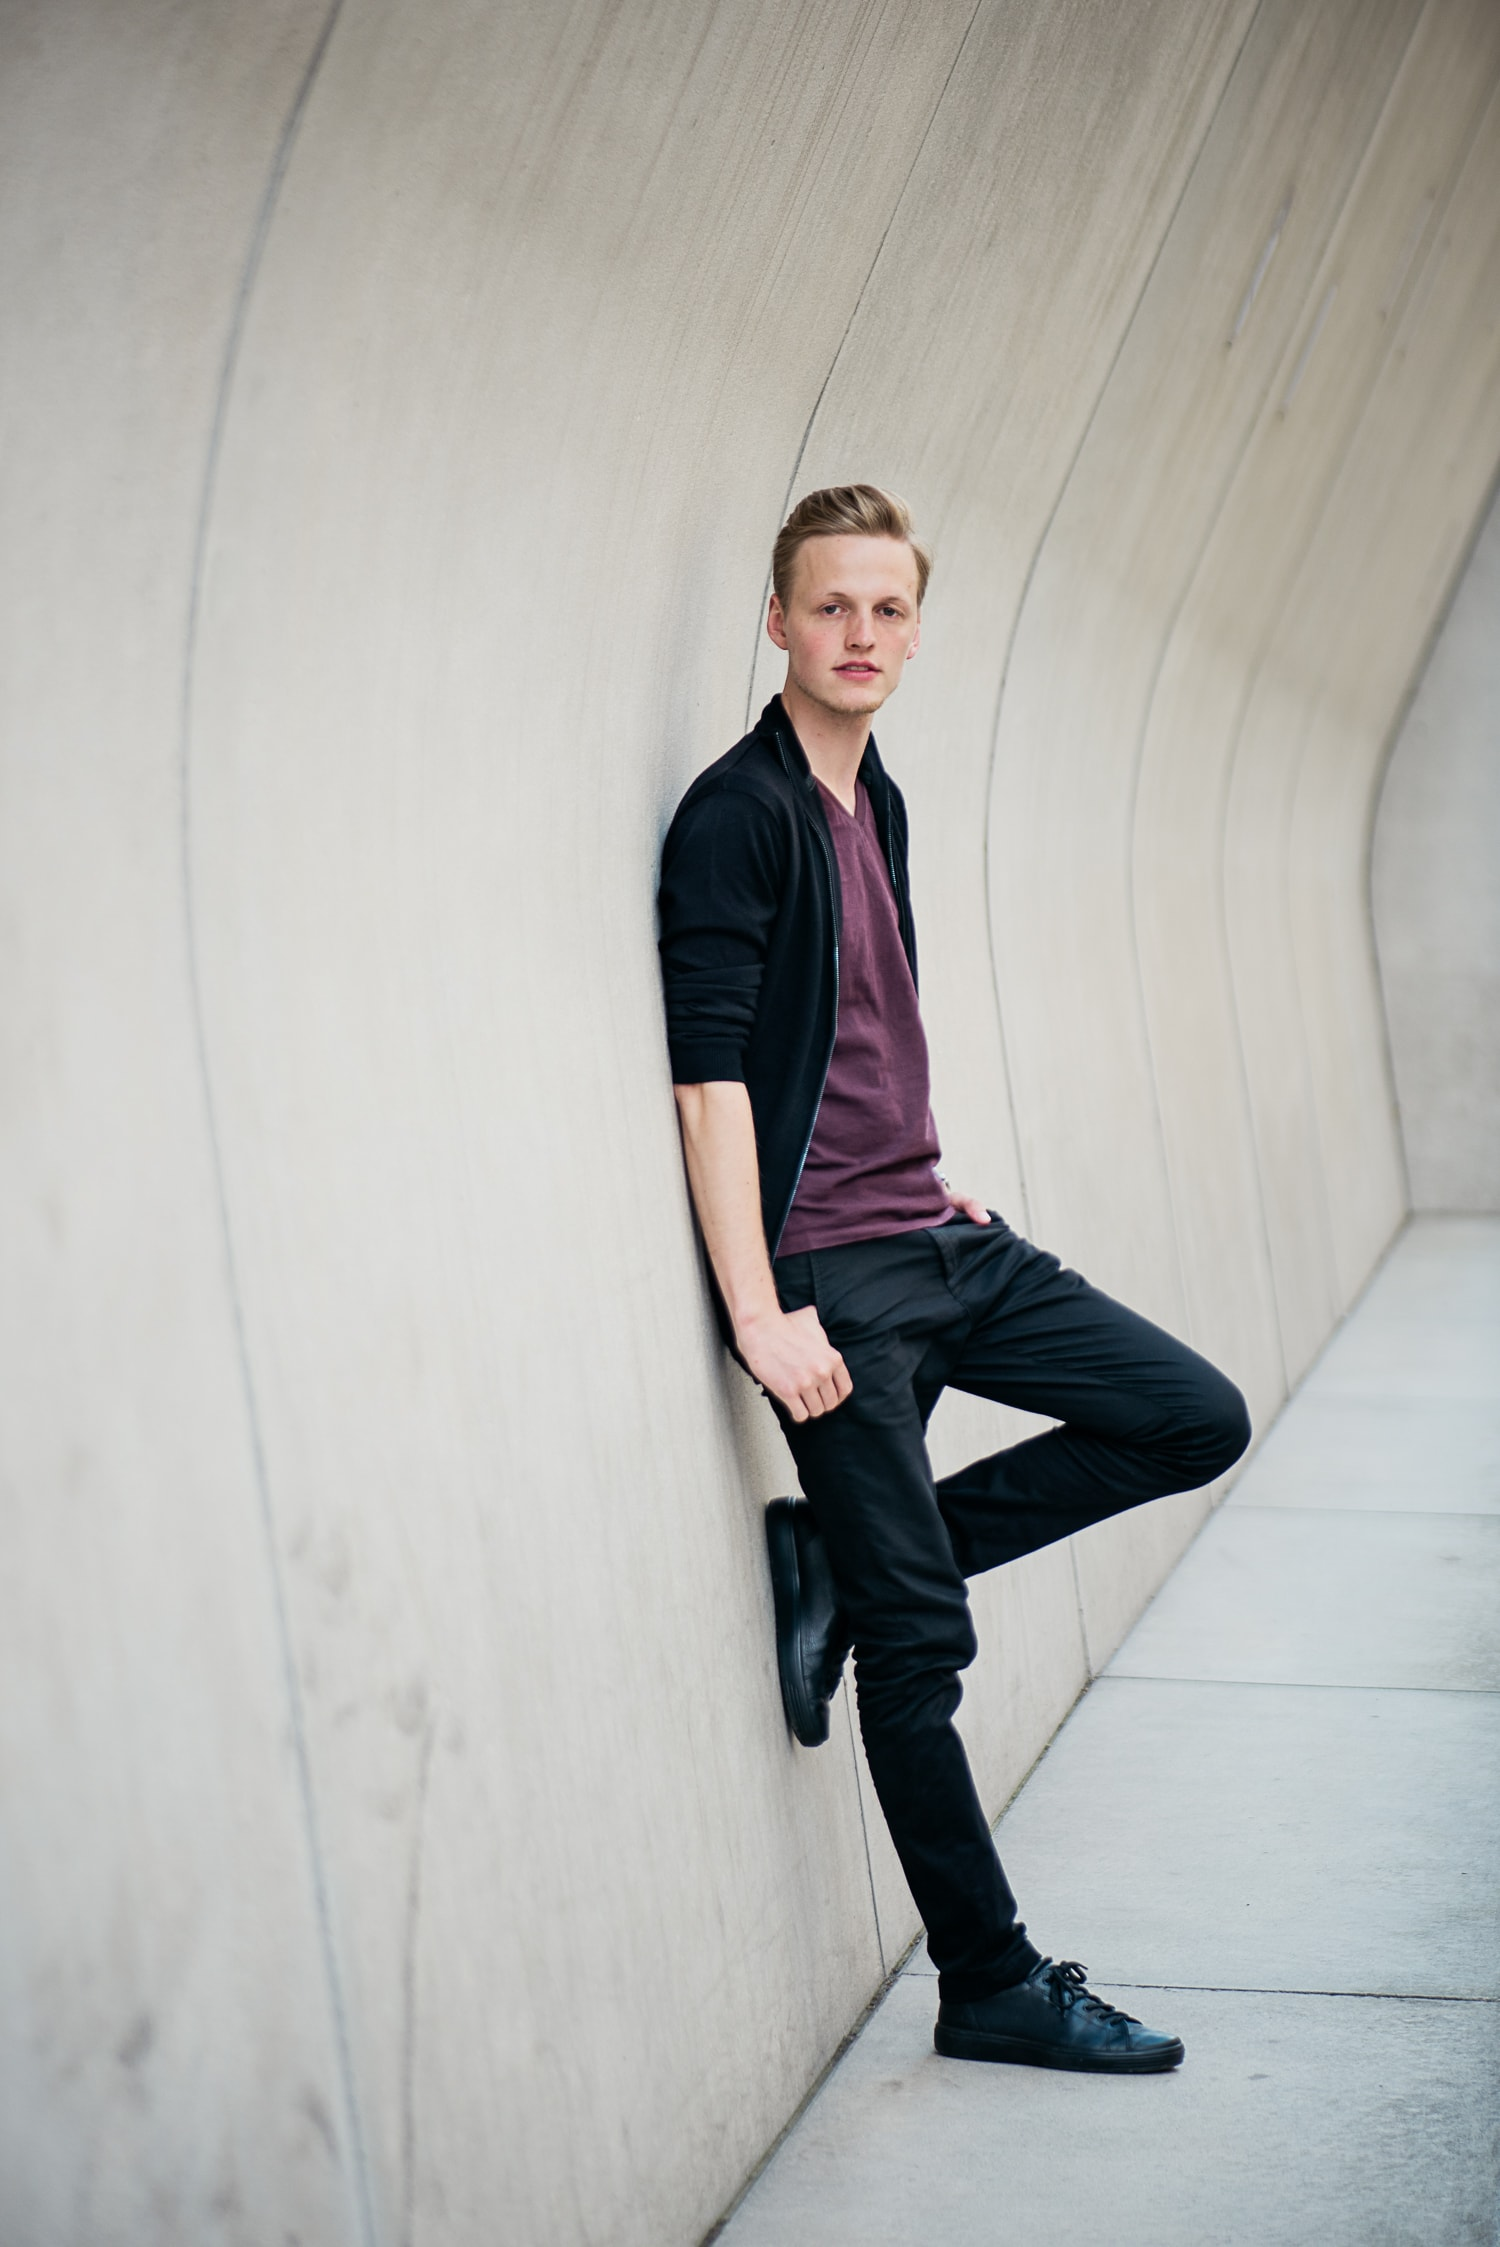 Hannes-web-25